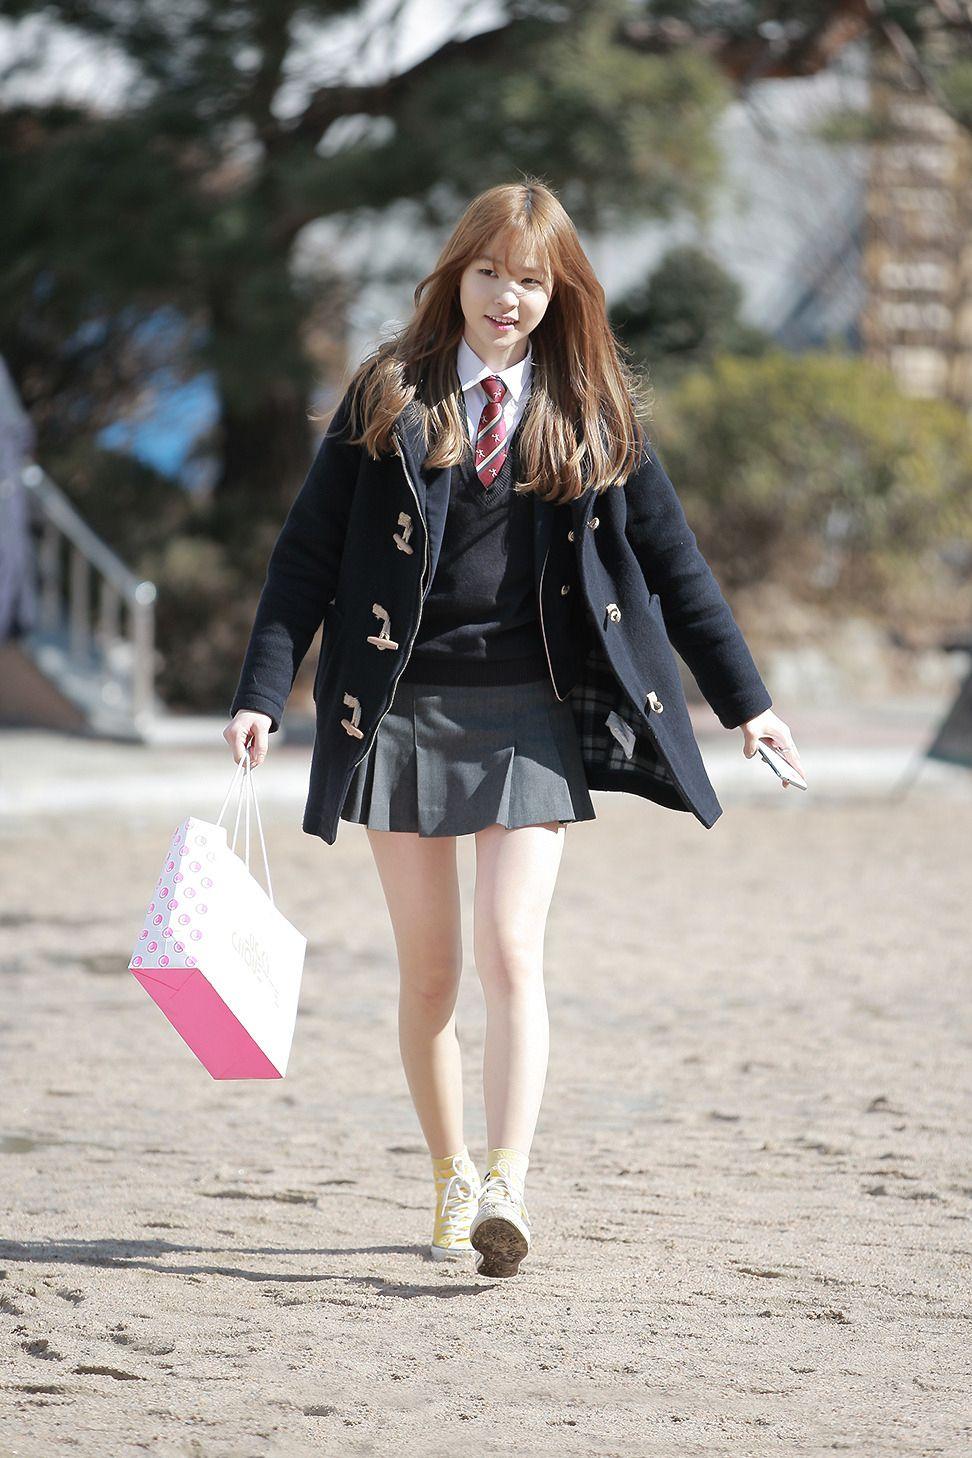 School uniforms in South Korea - Wikipedia, the free encyclopedia